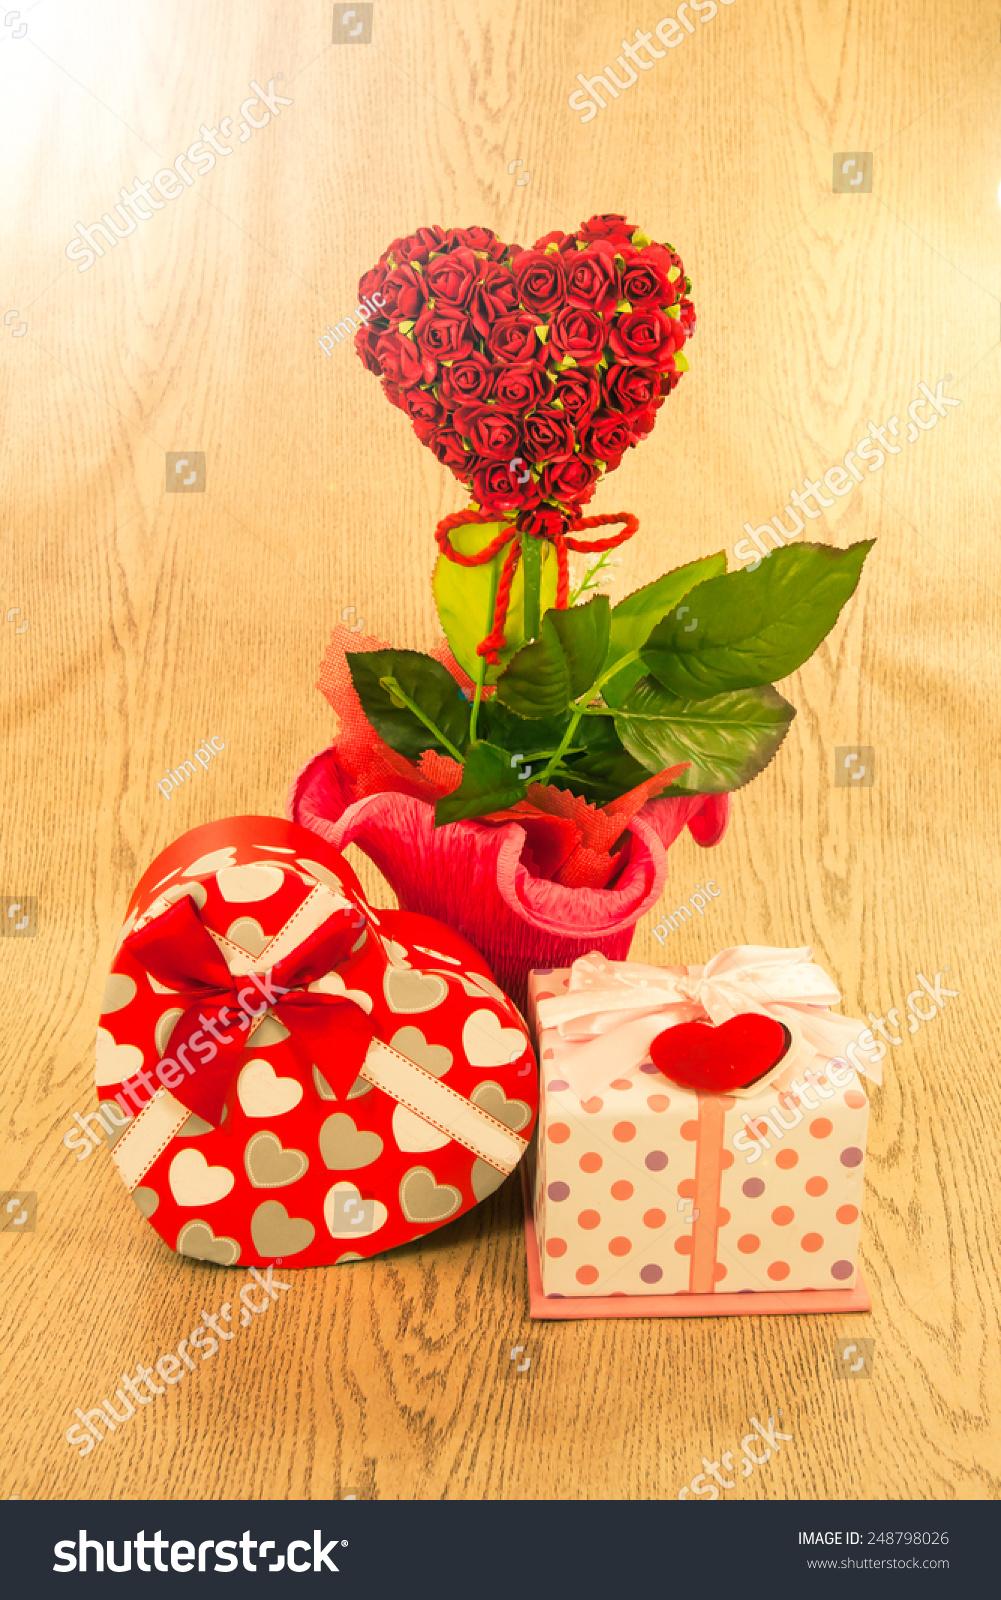 Love Decoration Gift Box Heart Shape Stock Photo (Edit Now ...